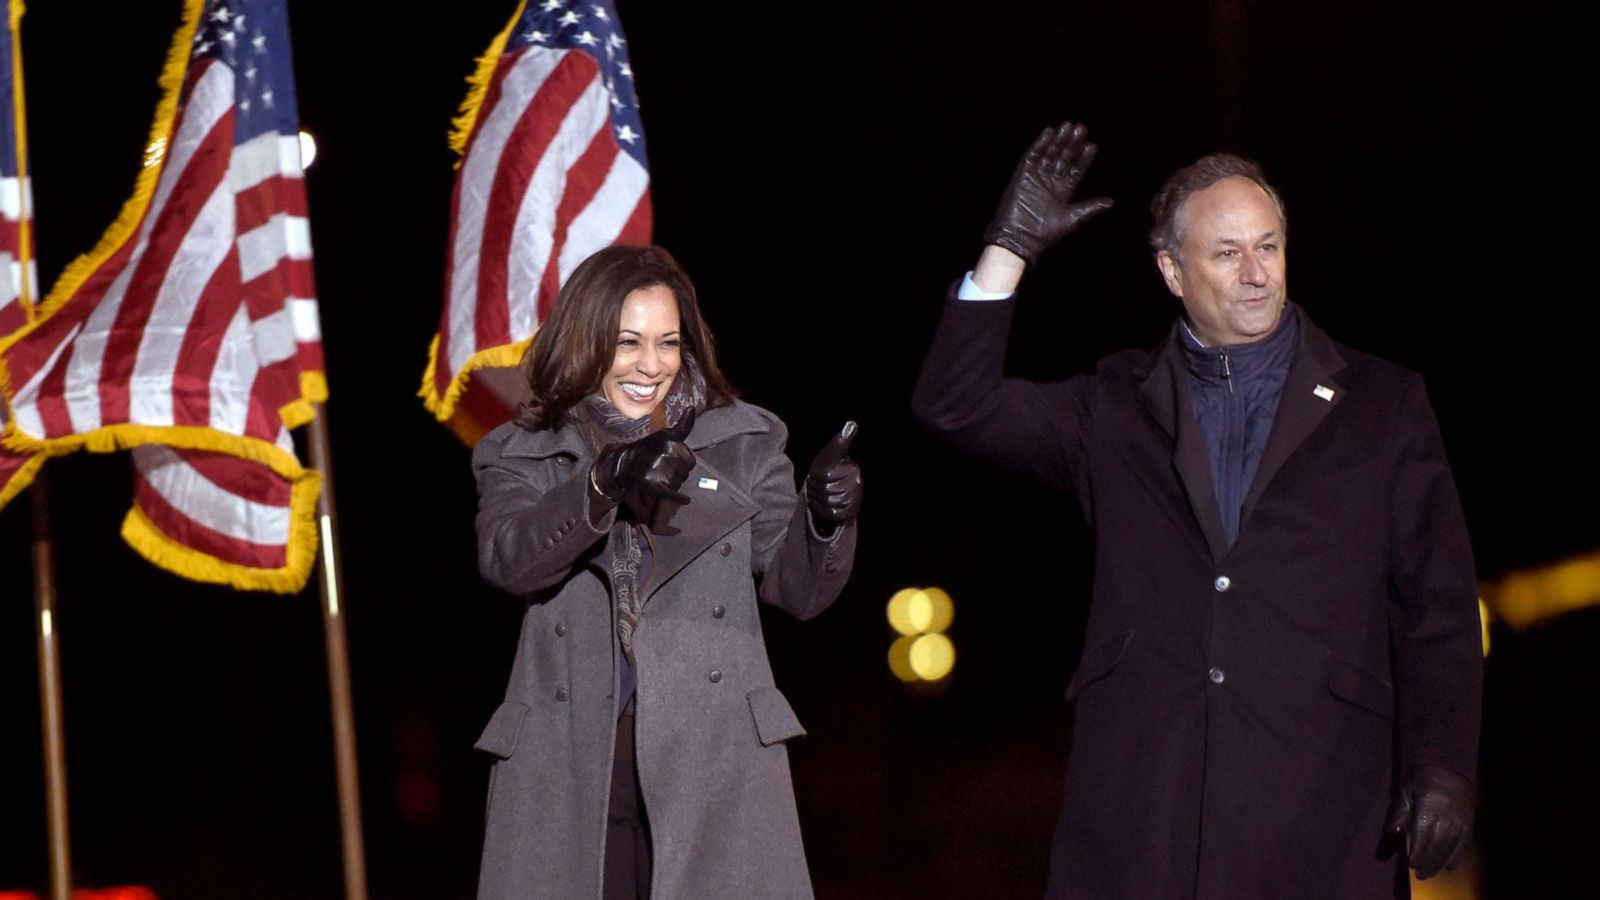 Vice President Elect Kamala Harris Husband Doug Emhoff Set To Become 1st Second Gentleman Abc News